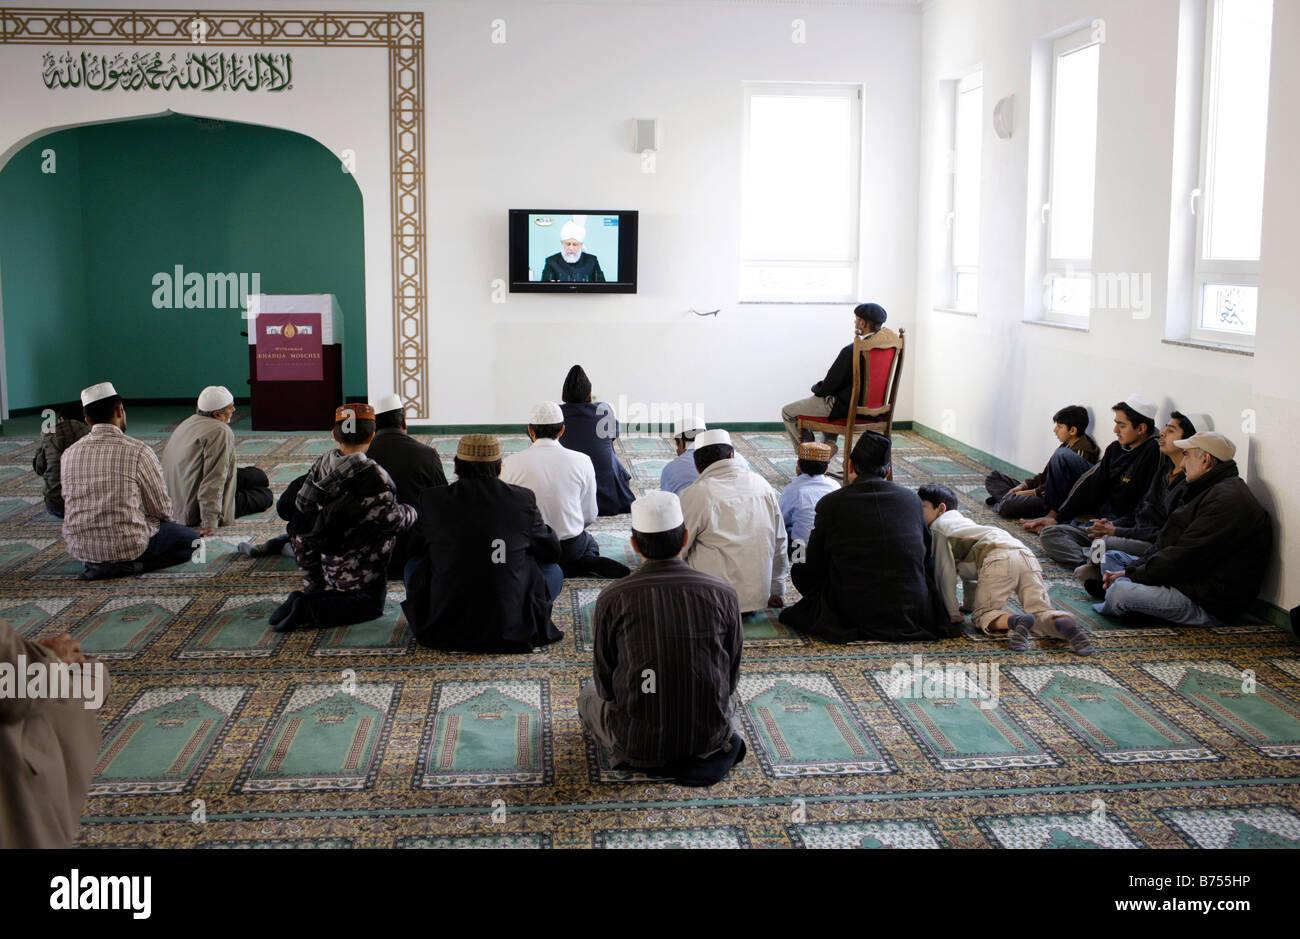 Prayer room at Khadija Mosque Berlin - Stock Image